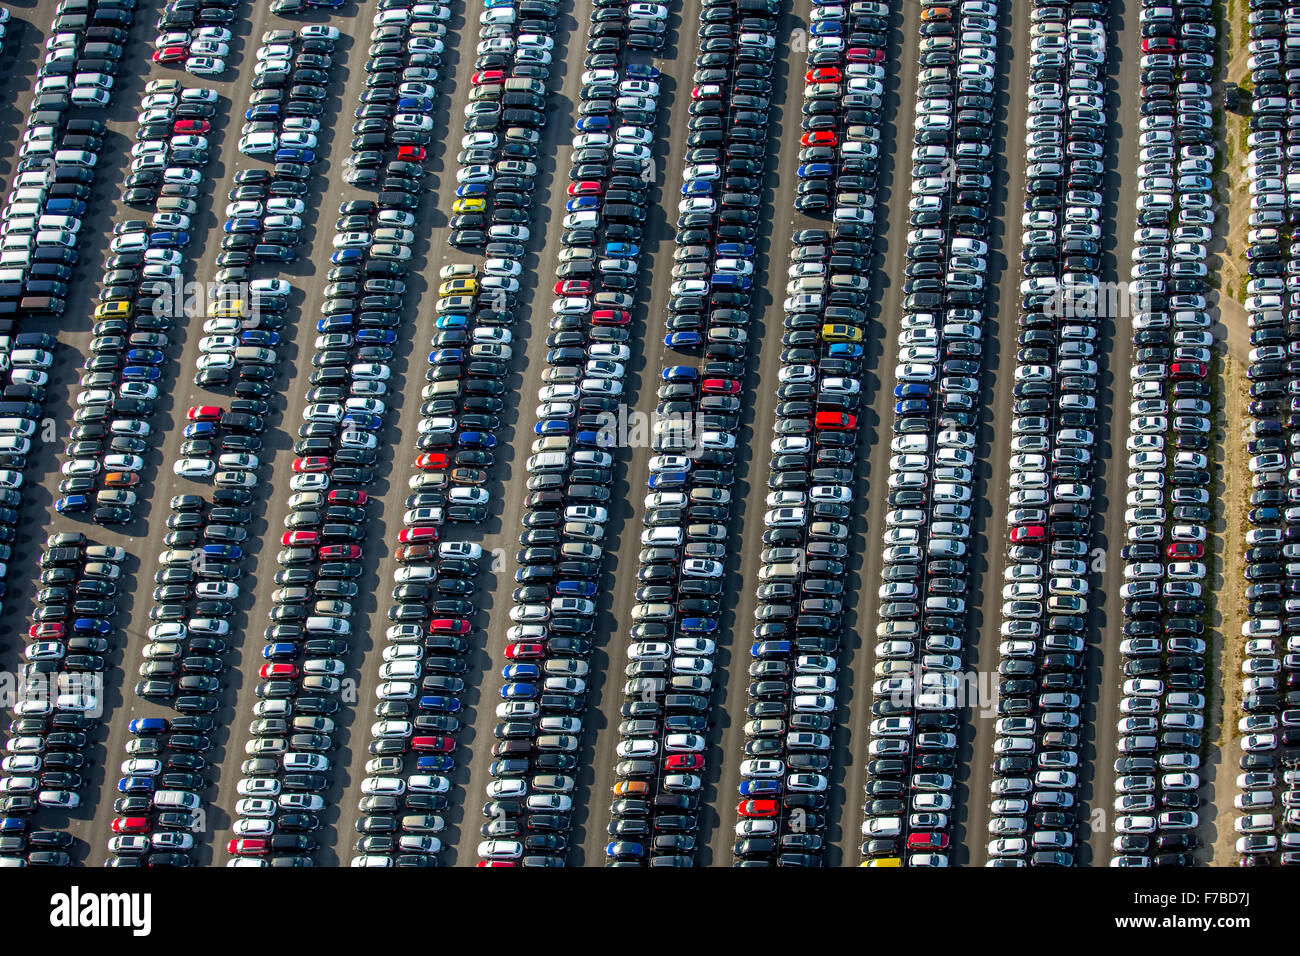 Car Importer, car trade, large parking, car sales, new car, car ...